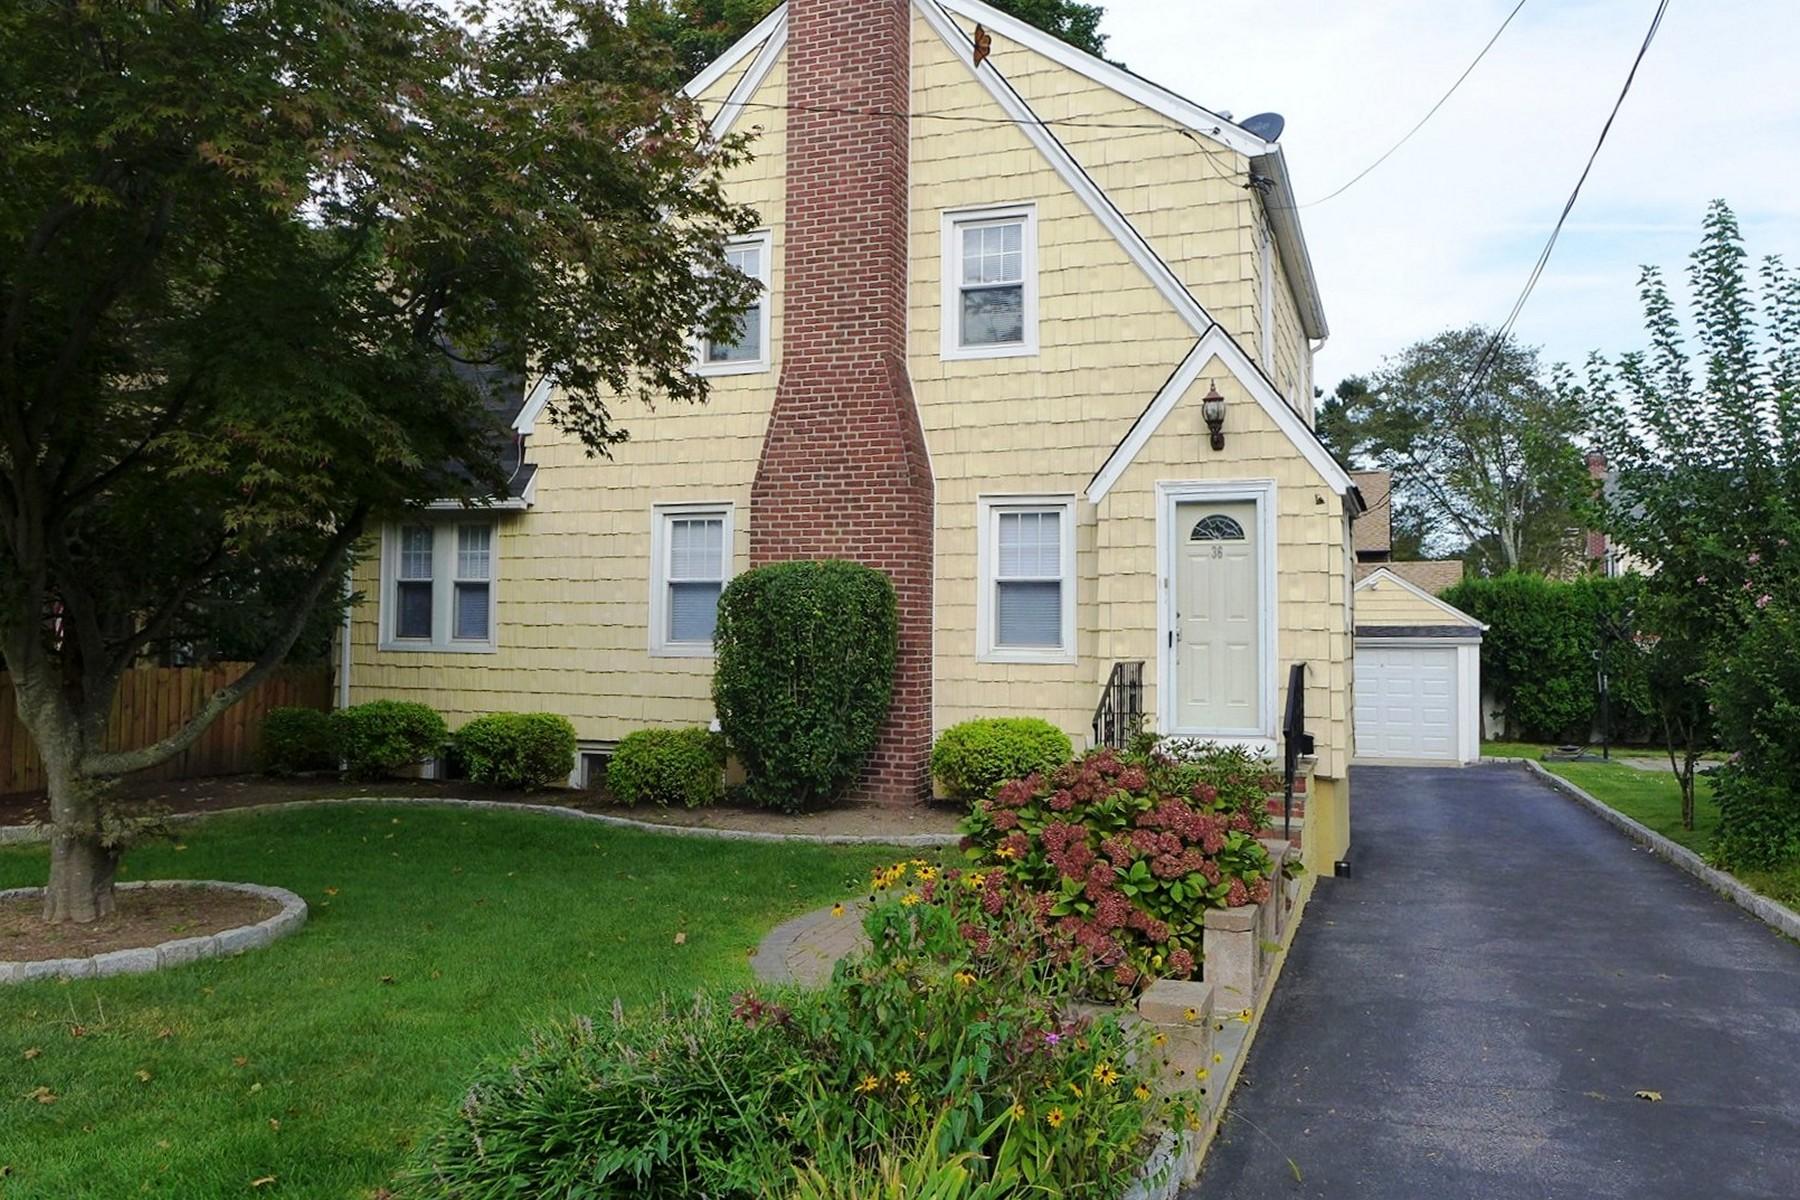 Single Family Home for Rent at Commuter's Dream 36 McBride Ave White Plains, New York 10603 United States